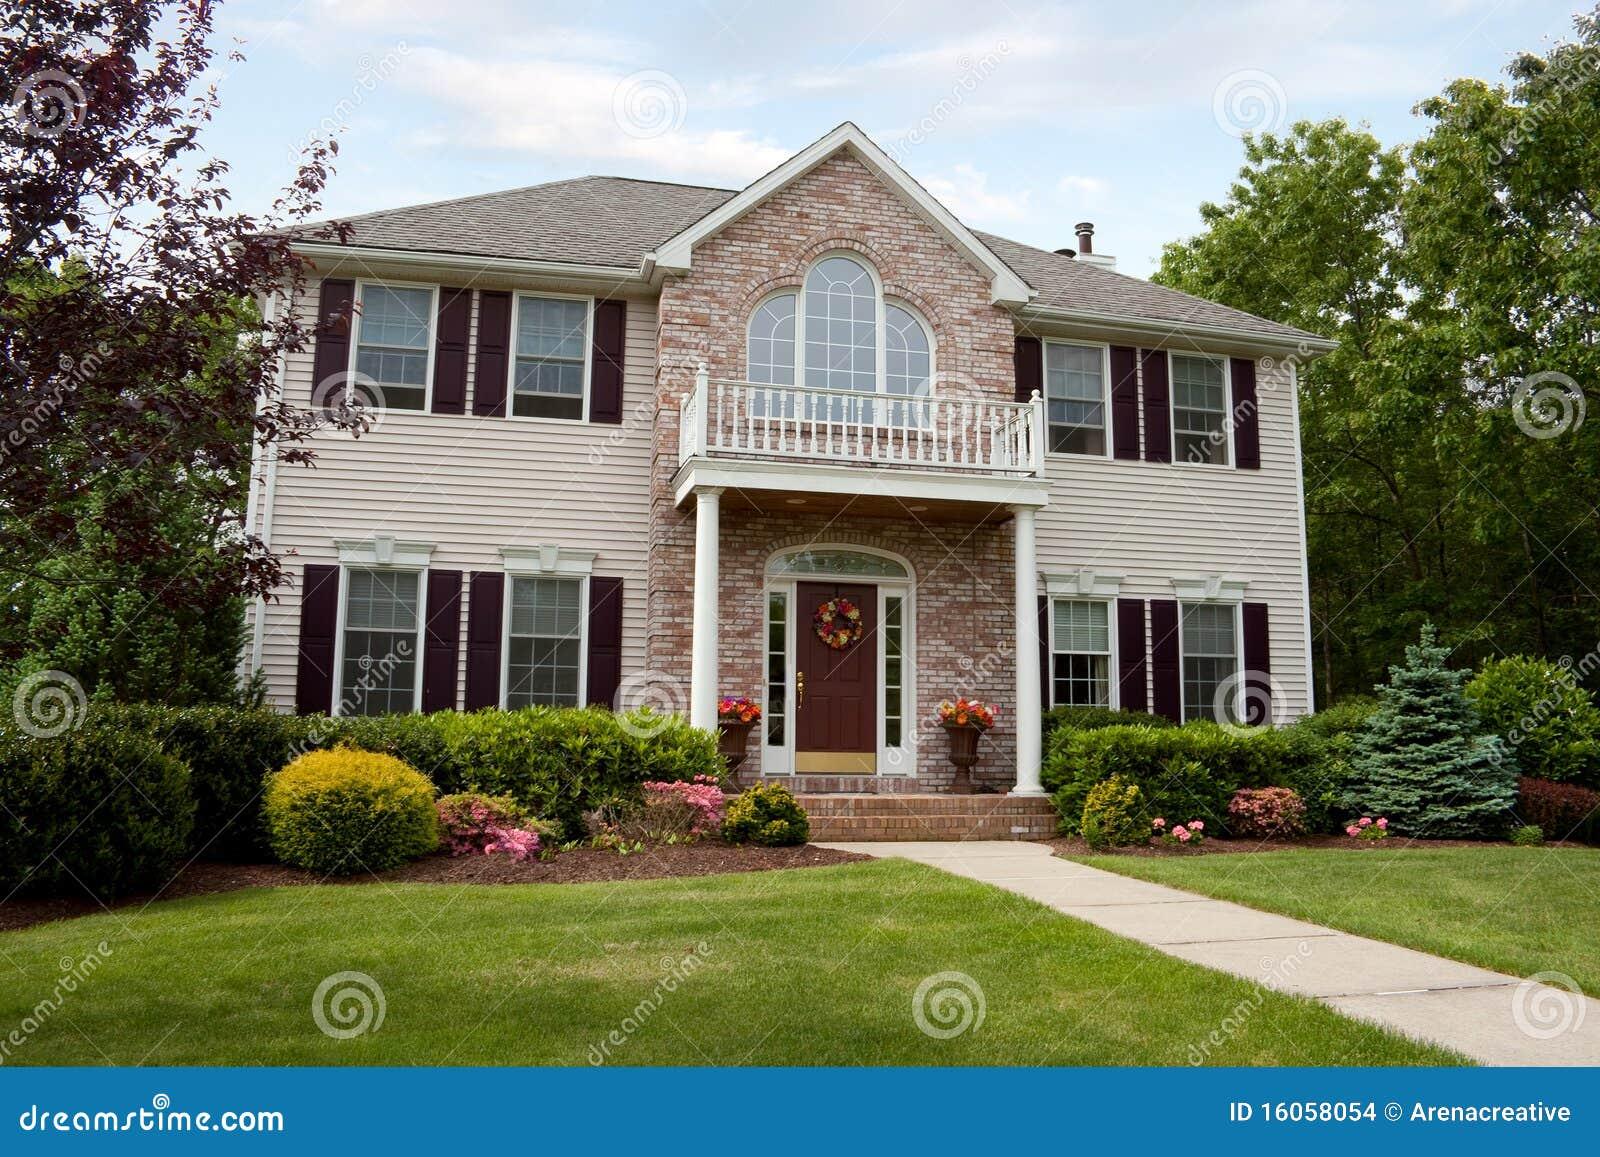 Modern Custom Built Luxury Home In A Residential Neighborhood This